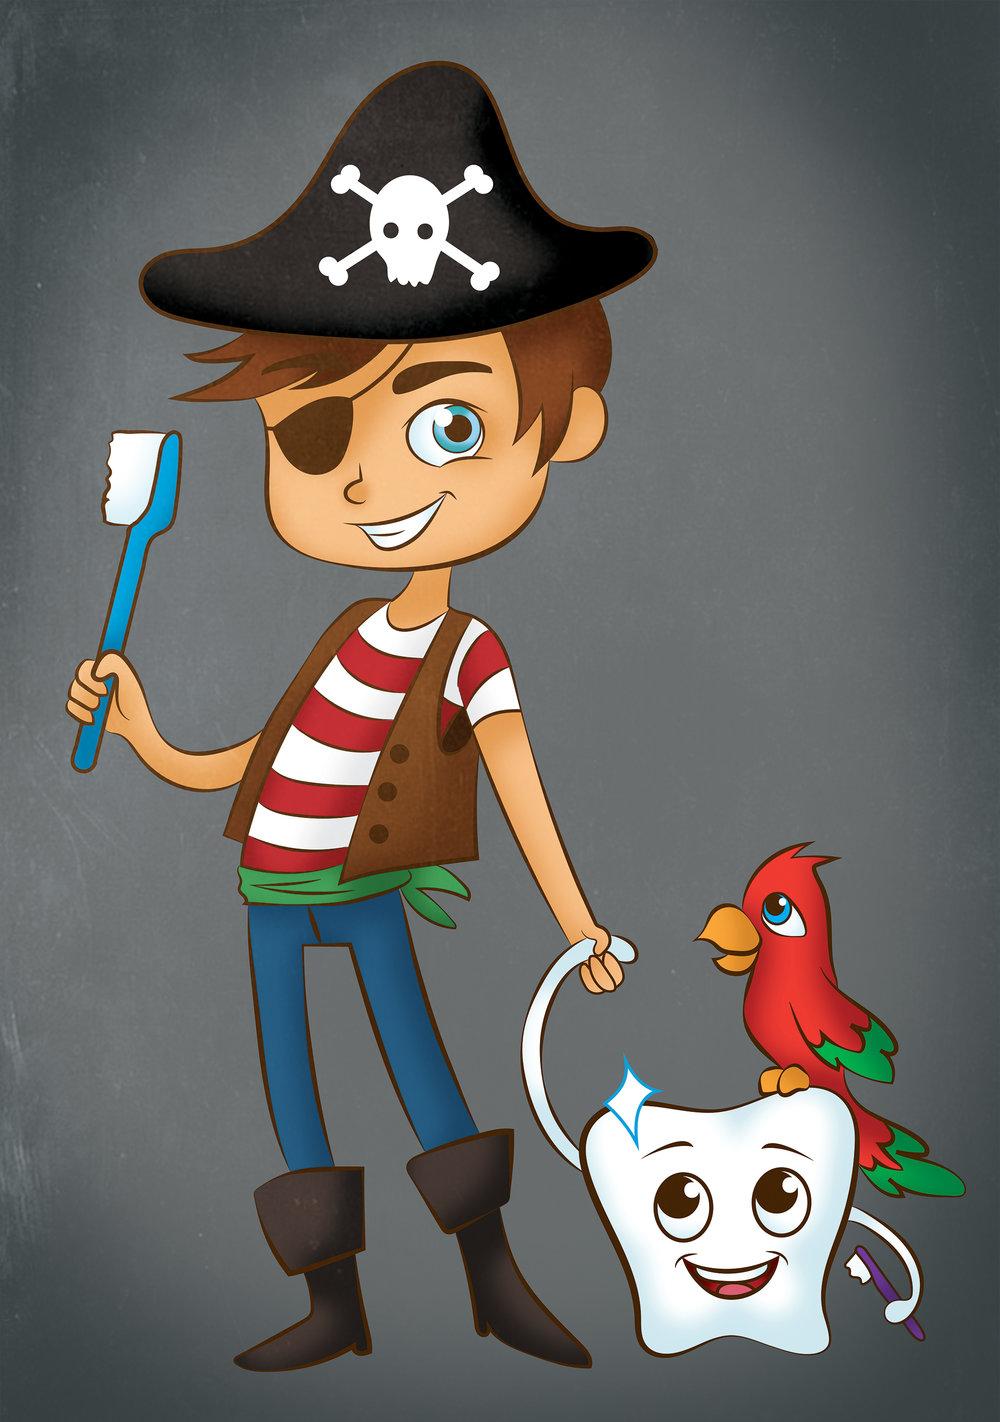 Pirate_Dentist.jpg